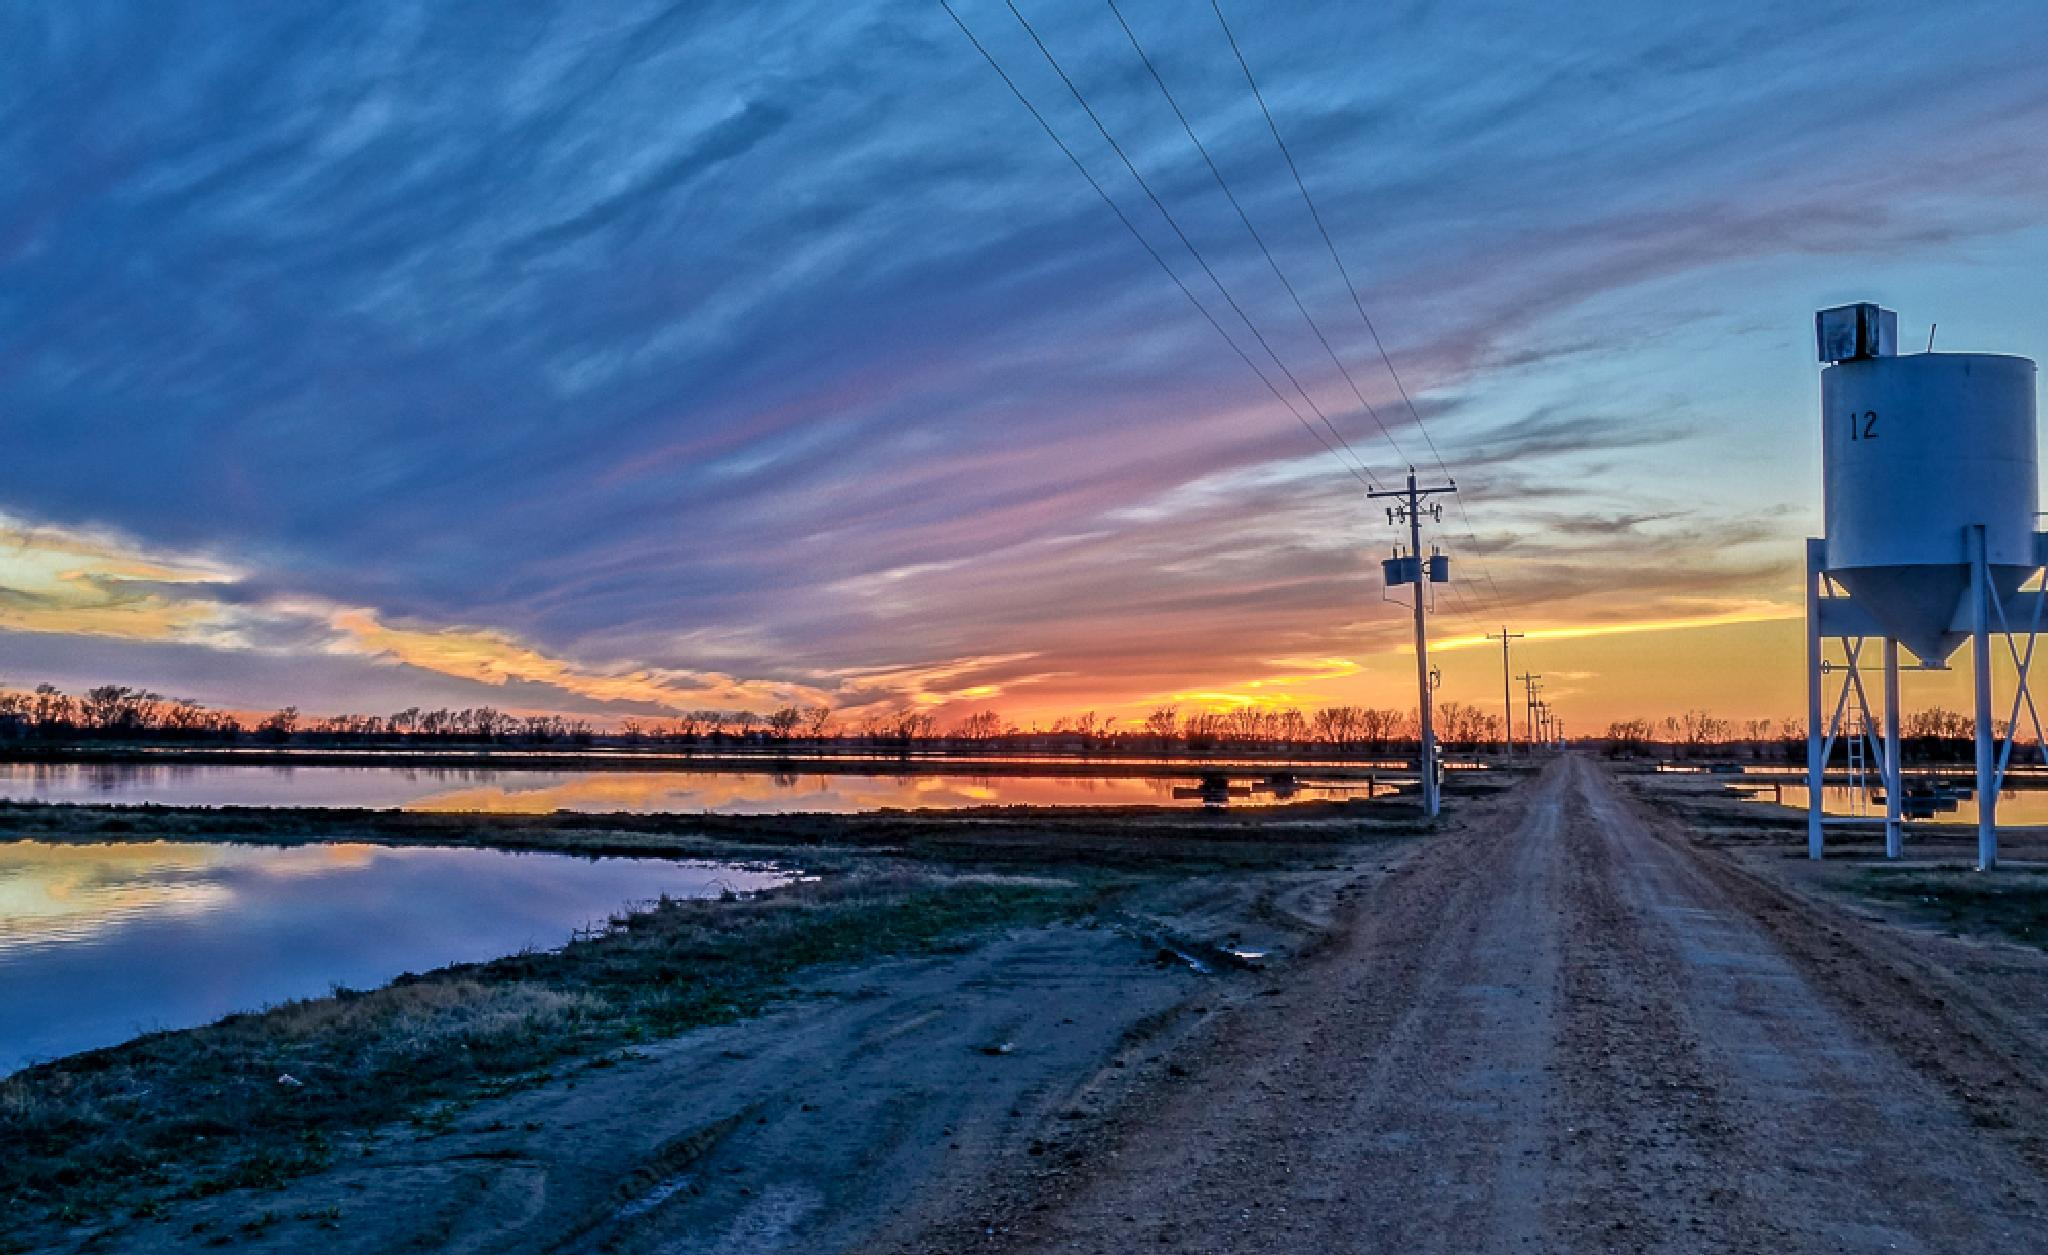 Winter sunset in the fish Farm..!! MS by pescado.feliz